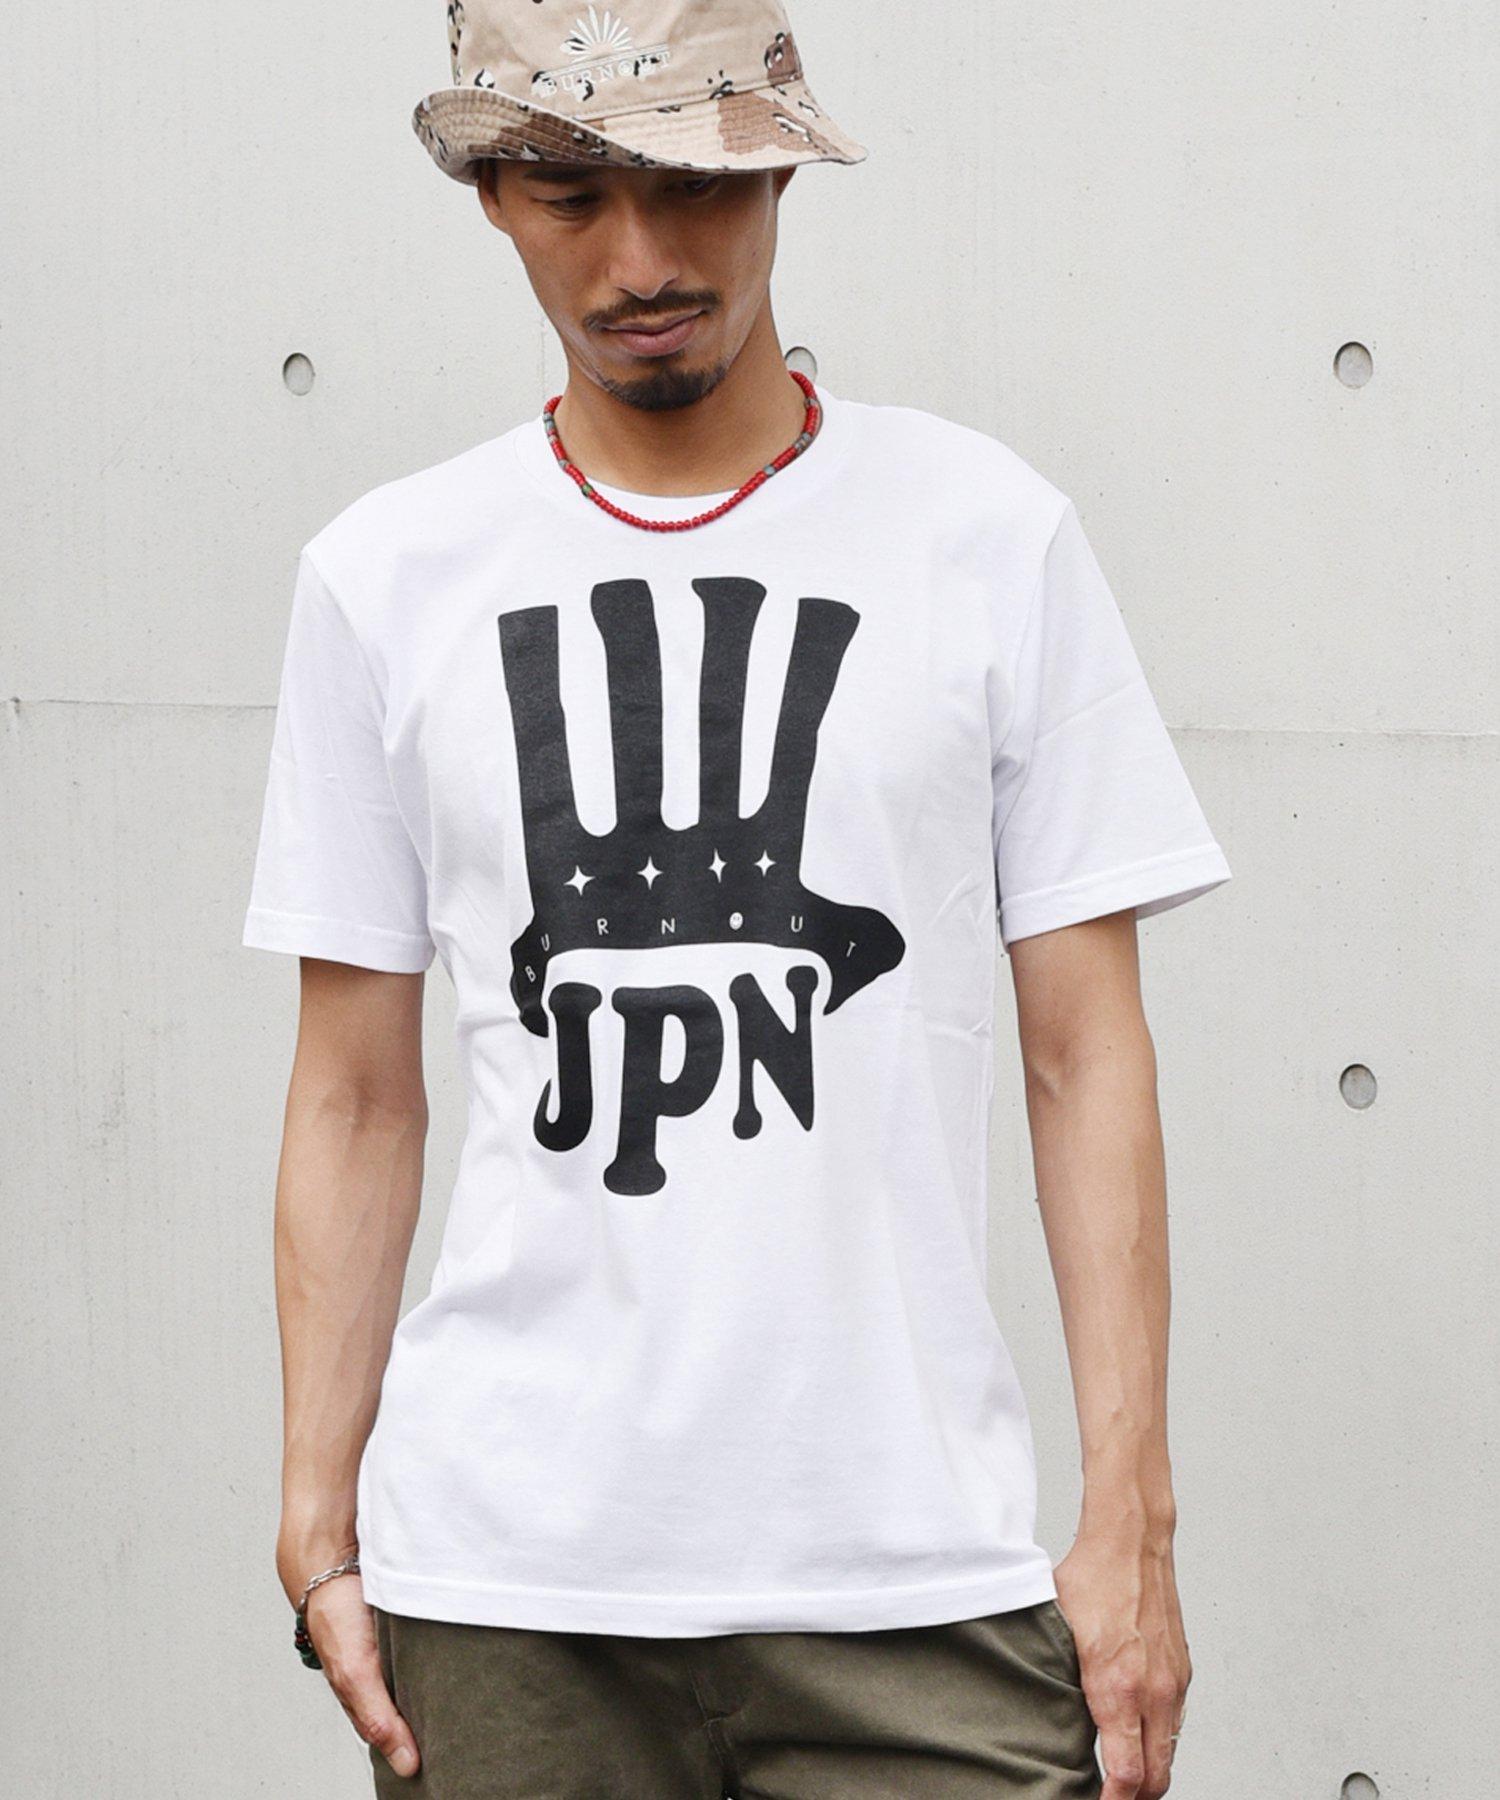 <img class='new_mark_img1' src='https://img.shop-pro.jp/img/new/icons15.gif' style='border:none;display:inline;margin:0px;padding:0px;width:auto;' />Burnout(バーンアウト) JPN T-shirt / ホワイト